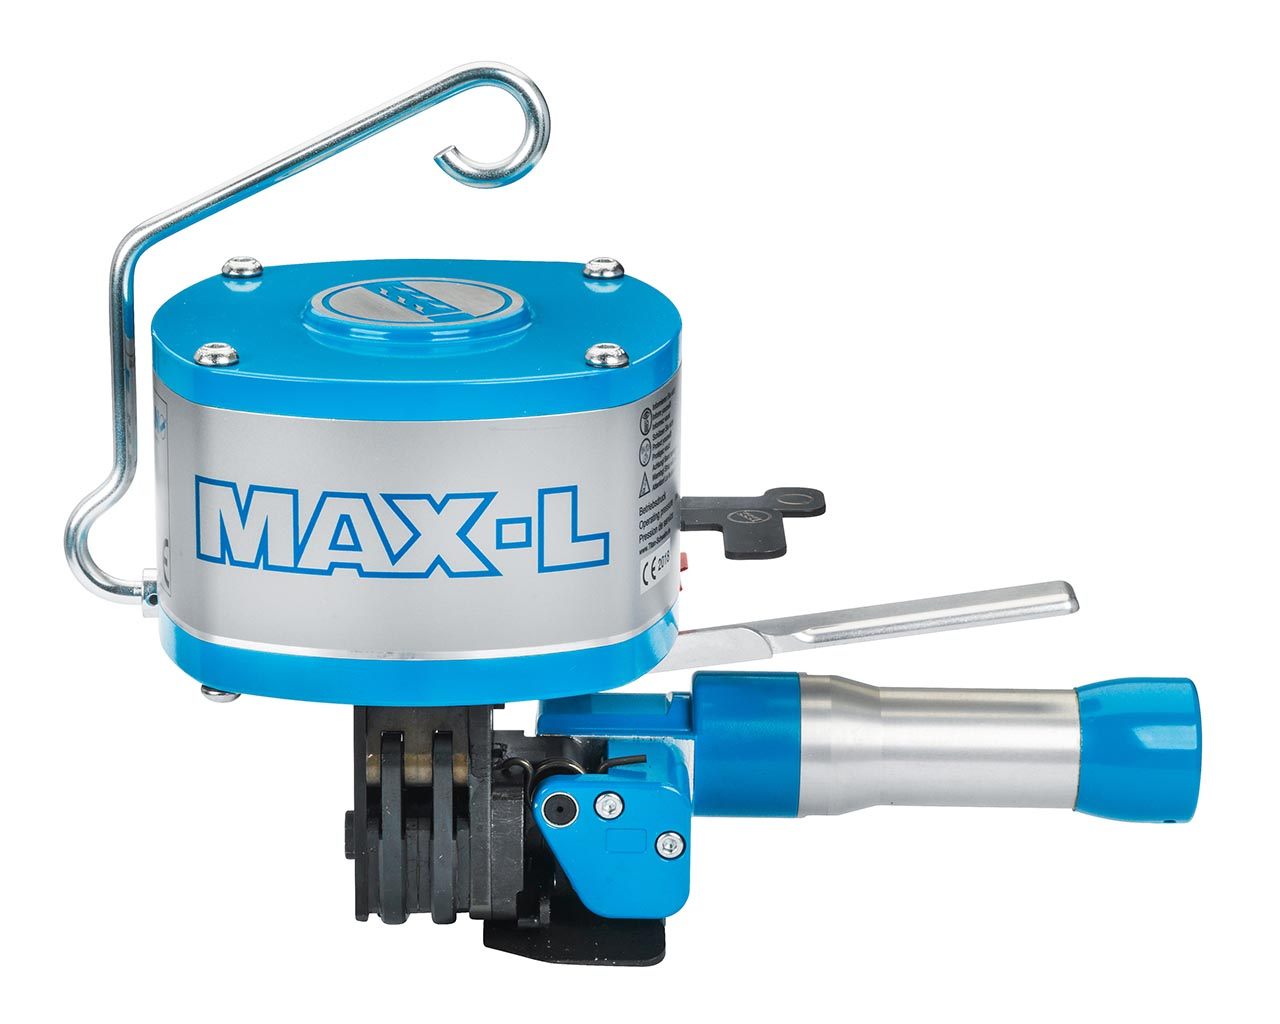 Reggiatrice pneumatica combinata AP TH Max-L - reggetta 19 mm x da 0,6 a 0,8 mm